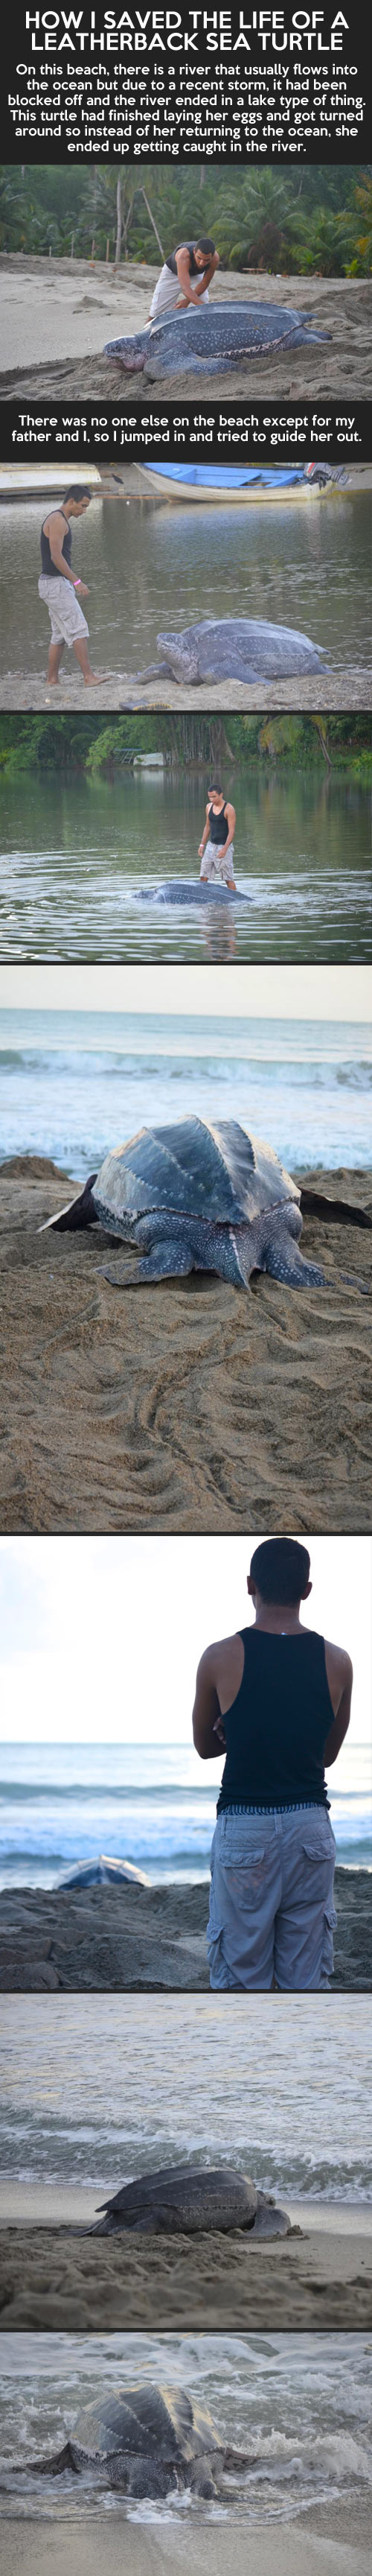 How I saved the life of a leatherback sea turtle...